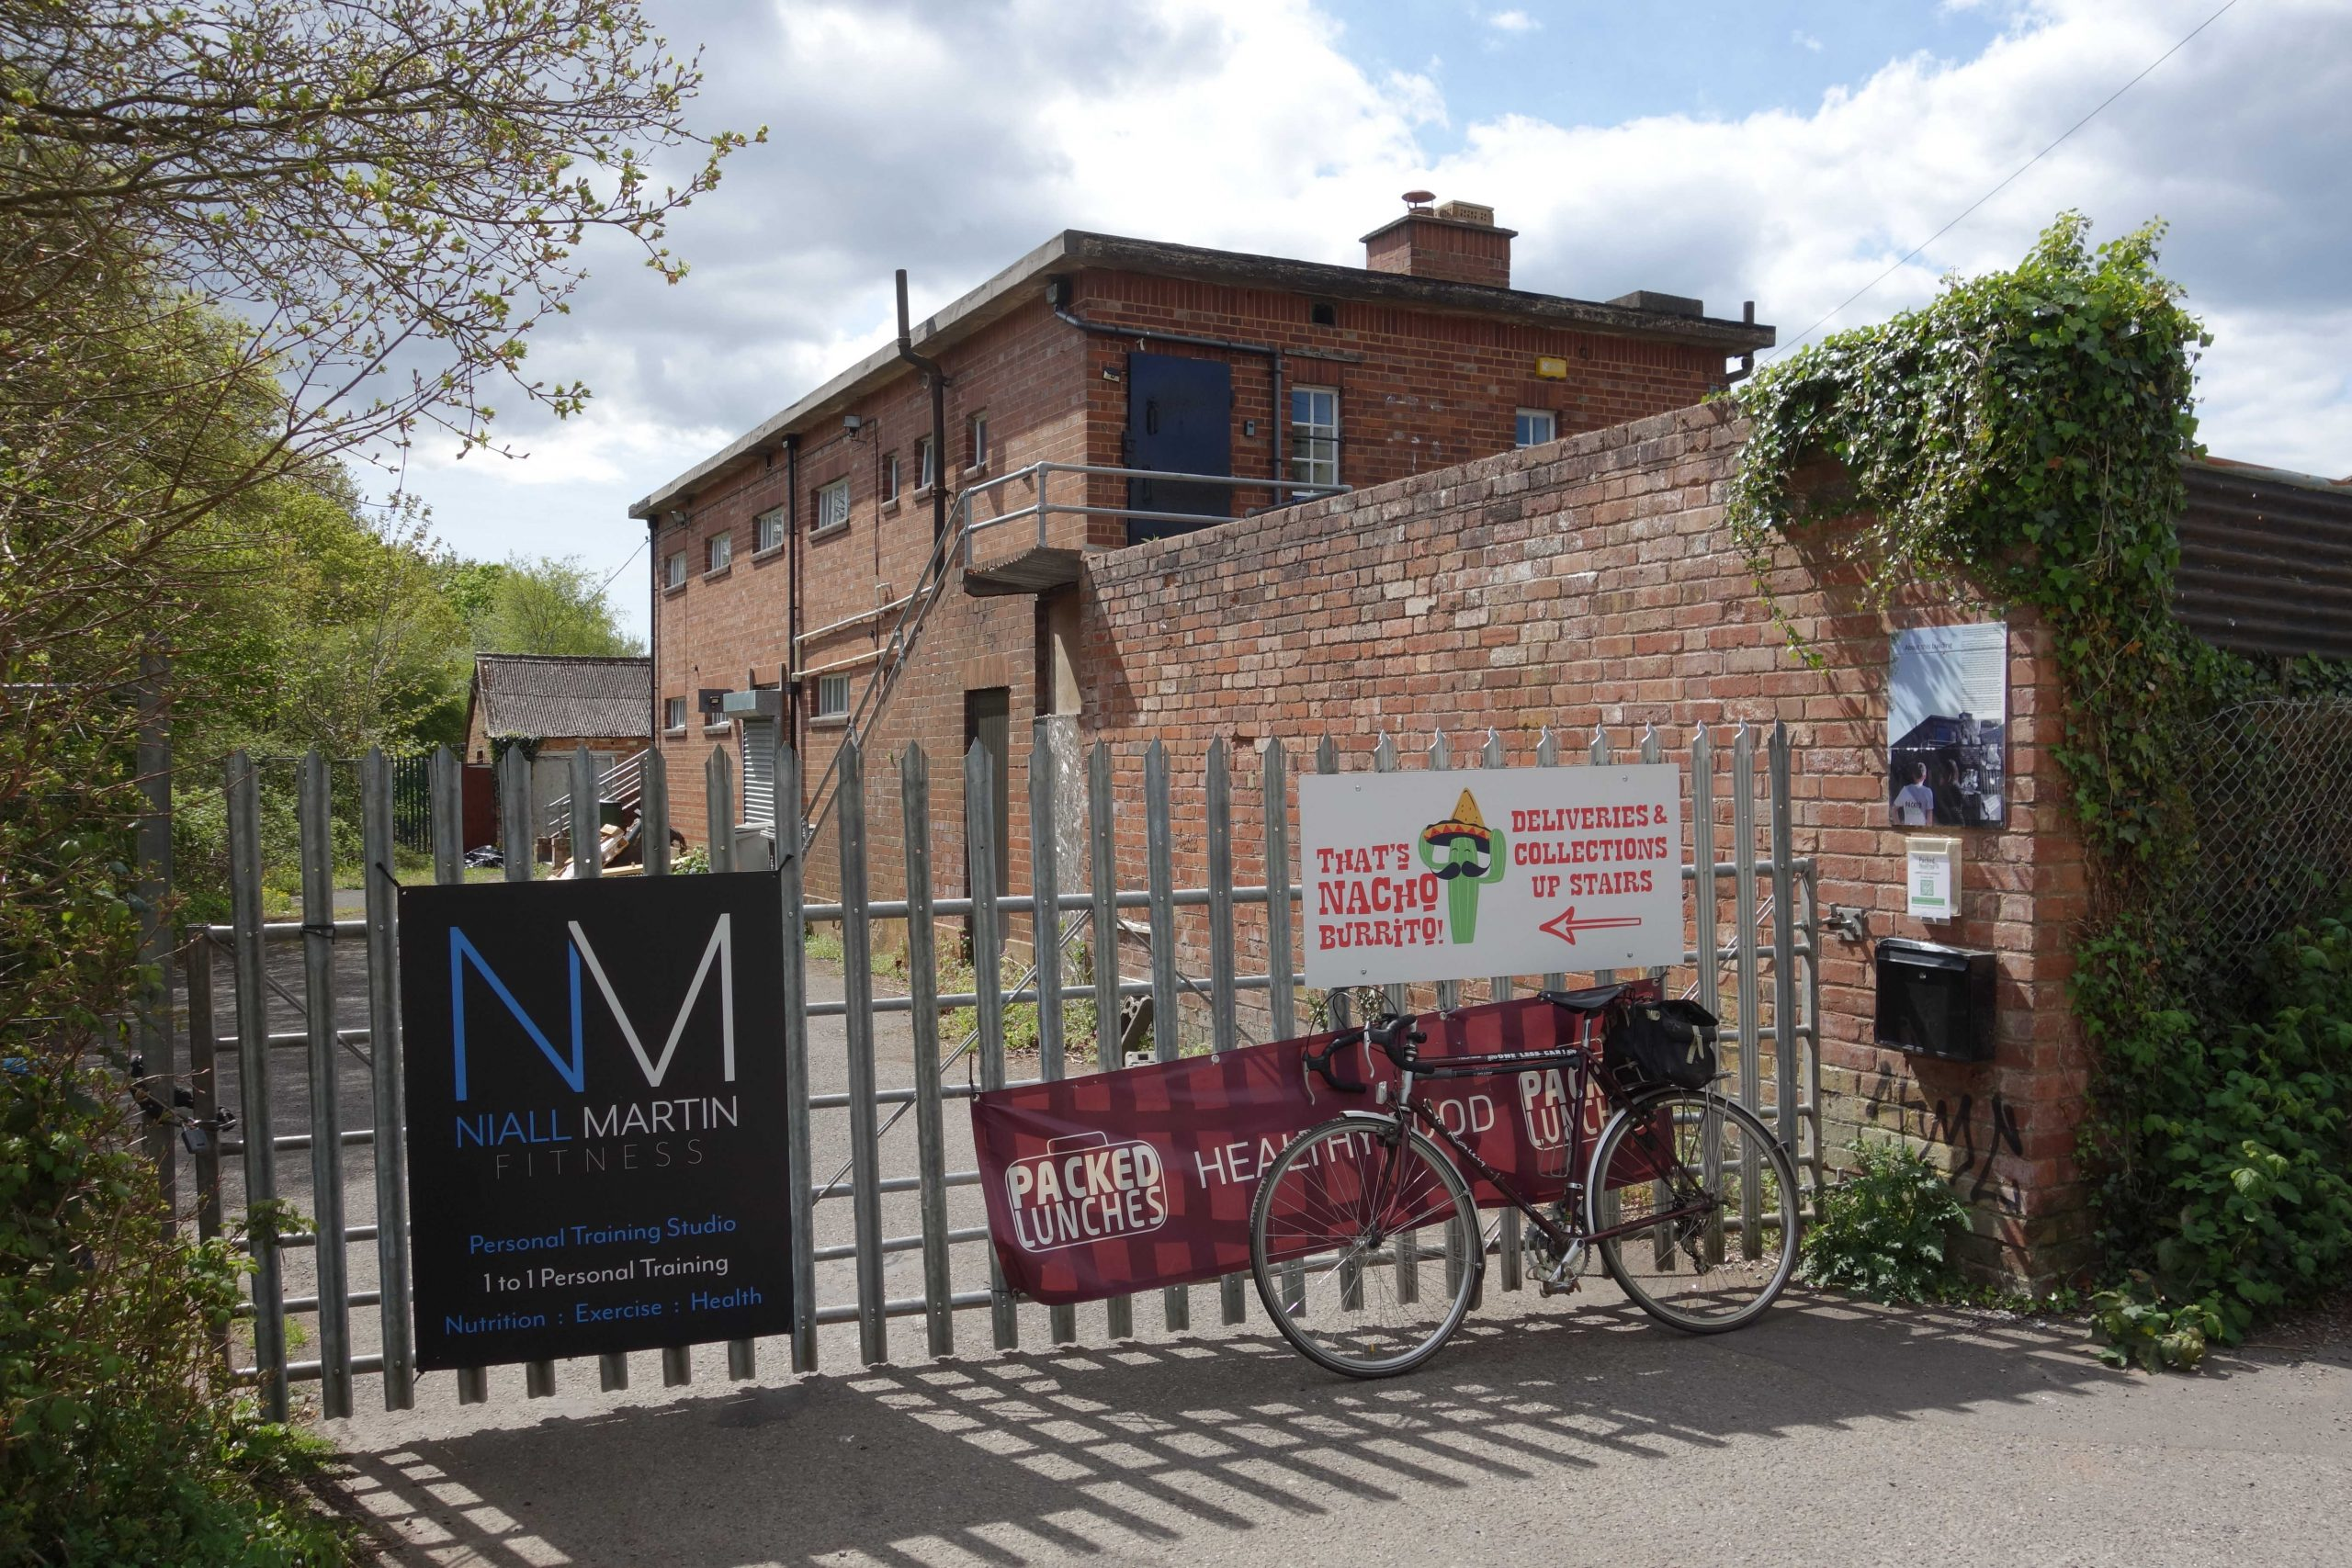 Whipton Decontamination Centre